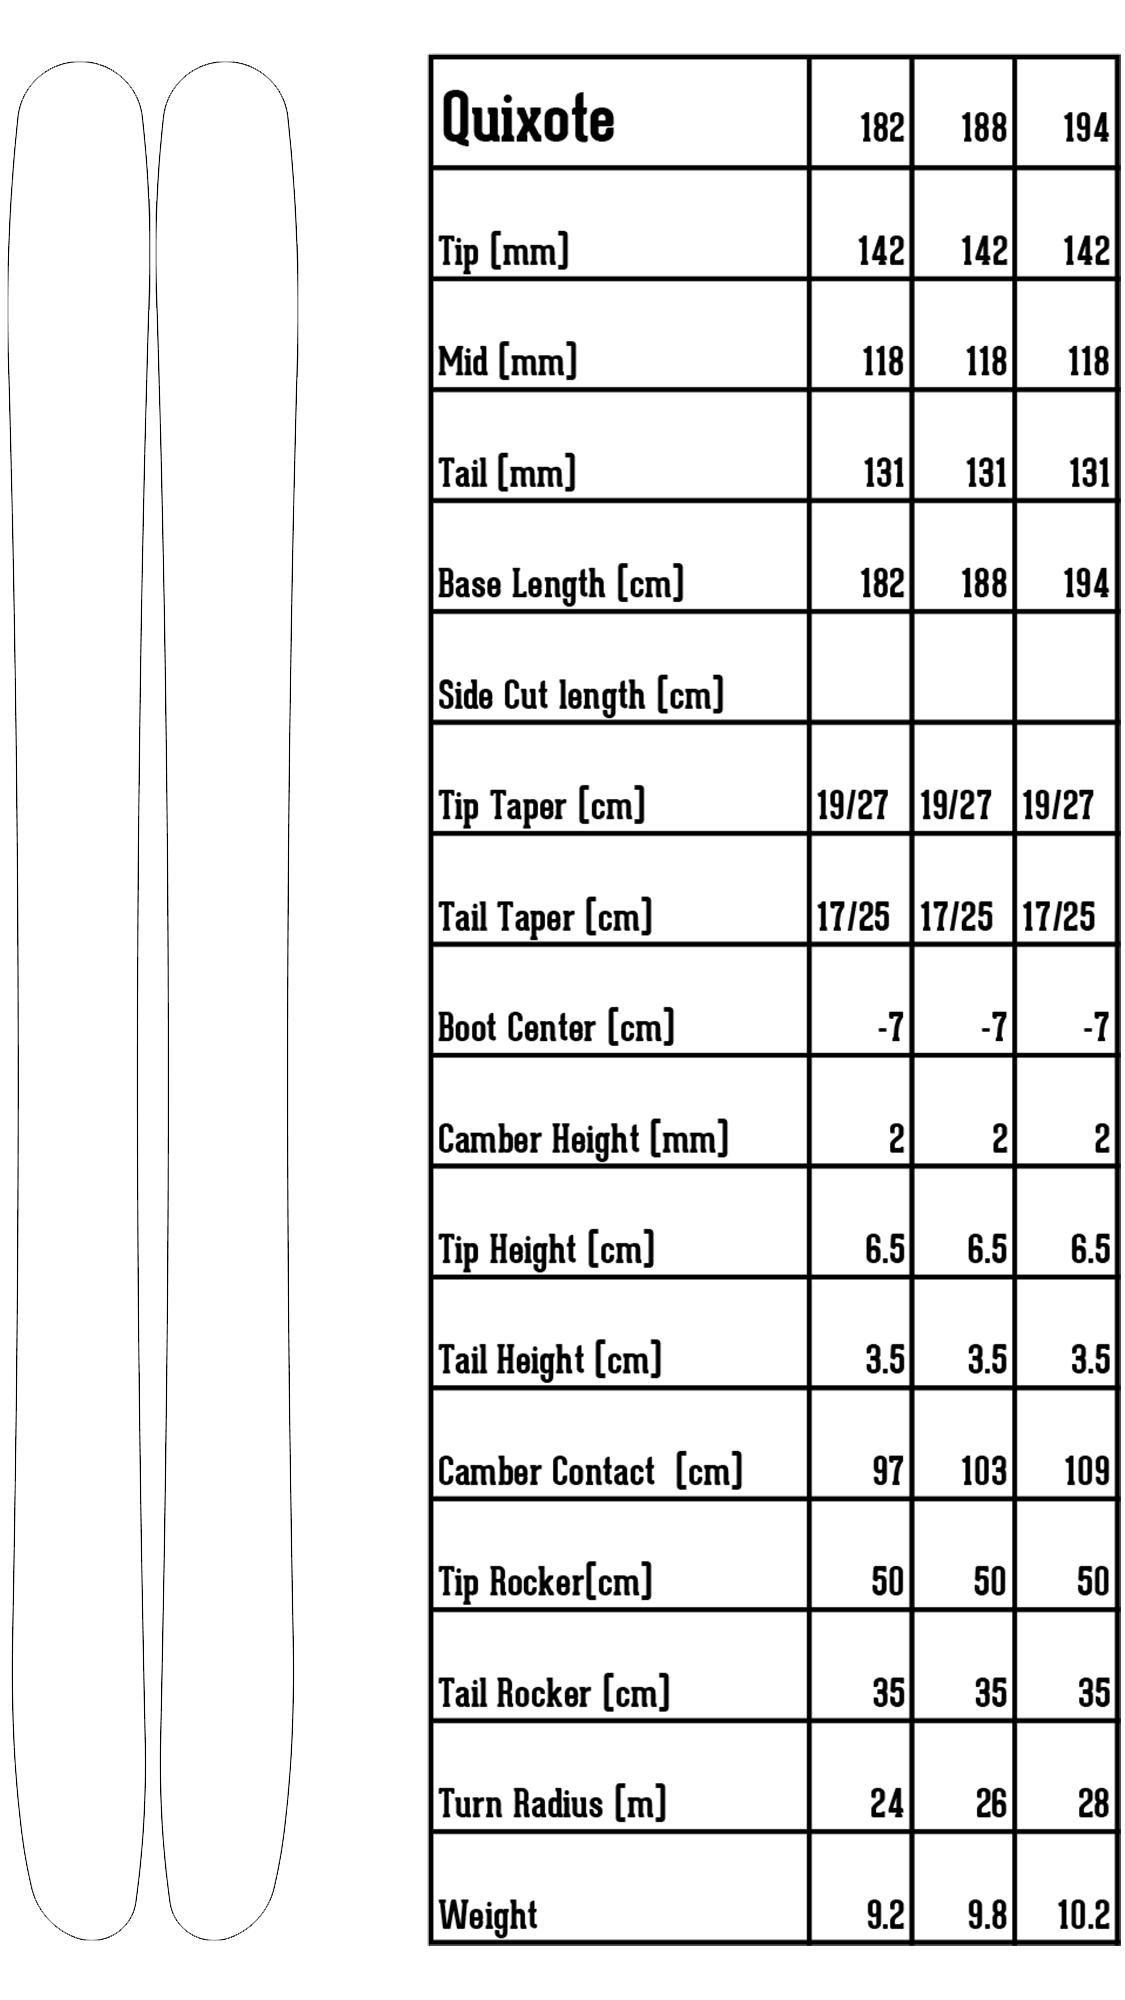 Quixote ski information spec sheet camber rocker tip tail height weight